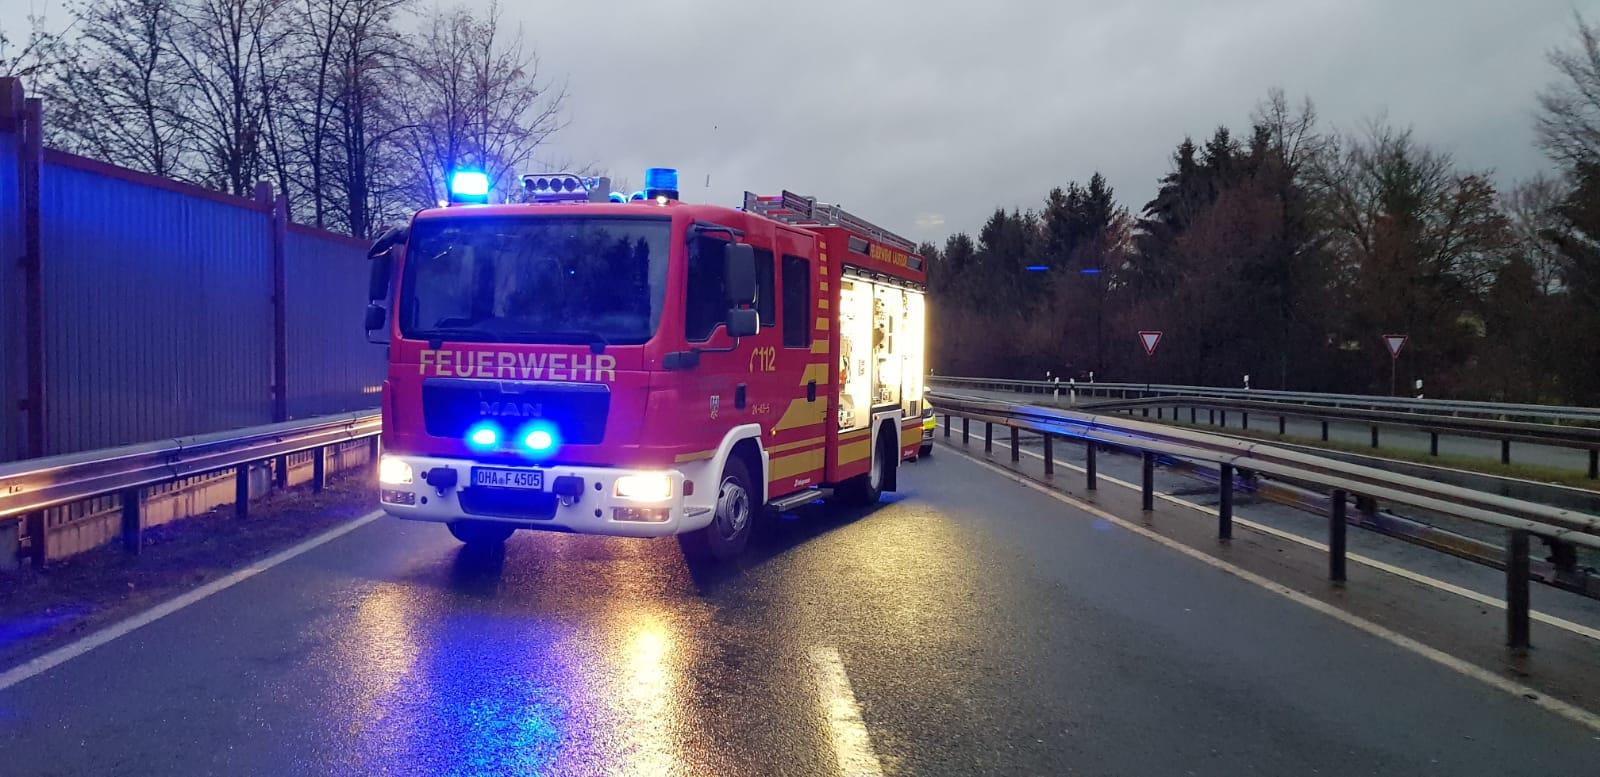 #0016 - LF10 Feuerwehr Osterode Ortsfeuerwehr Lasfelde